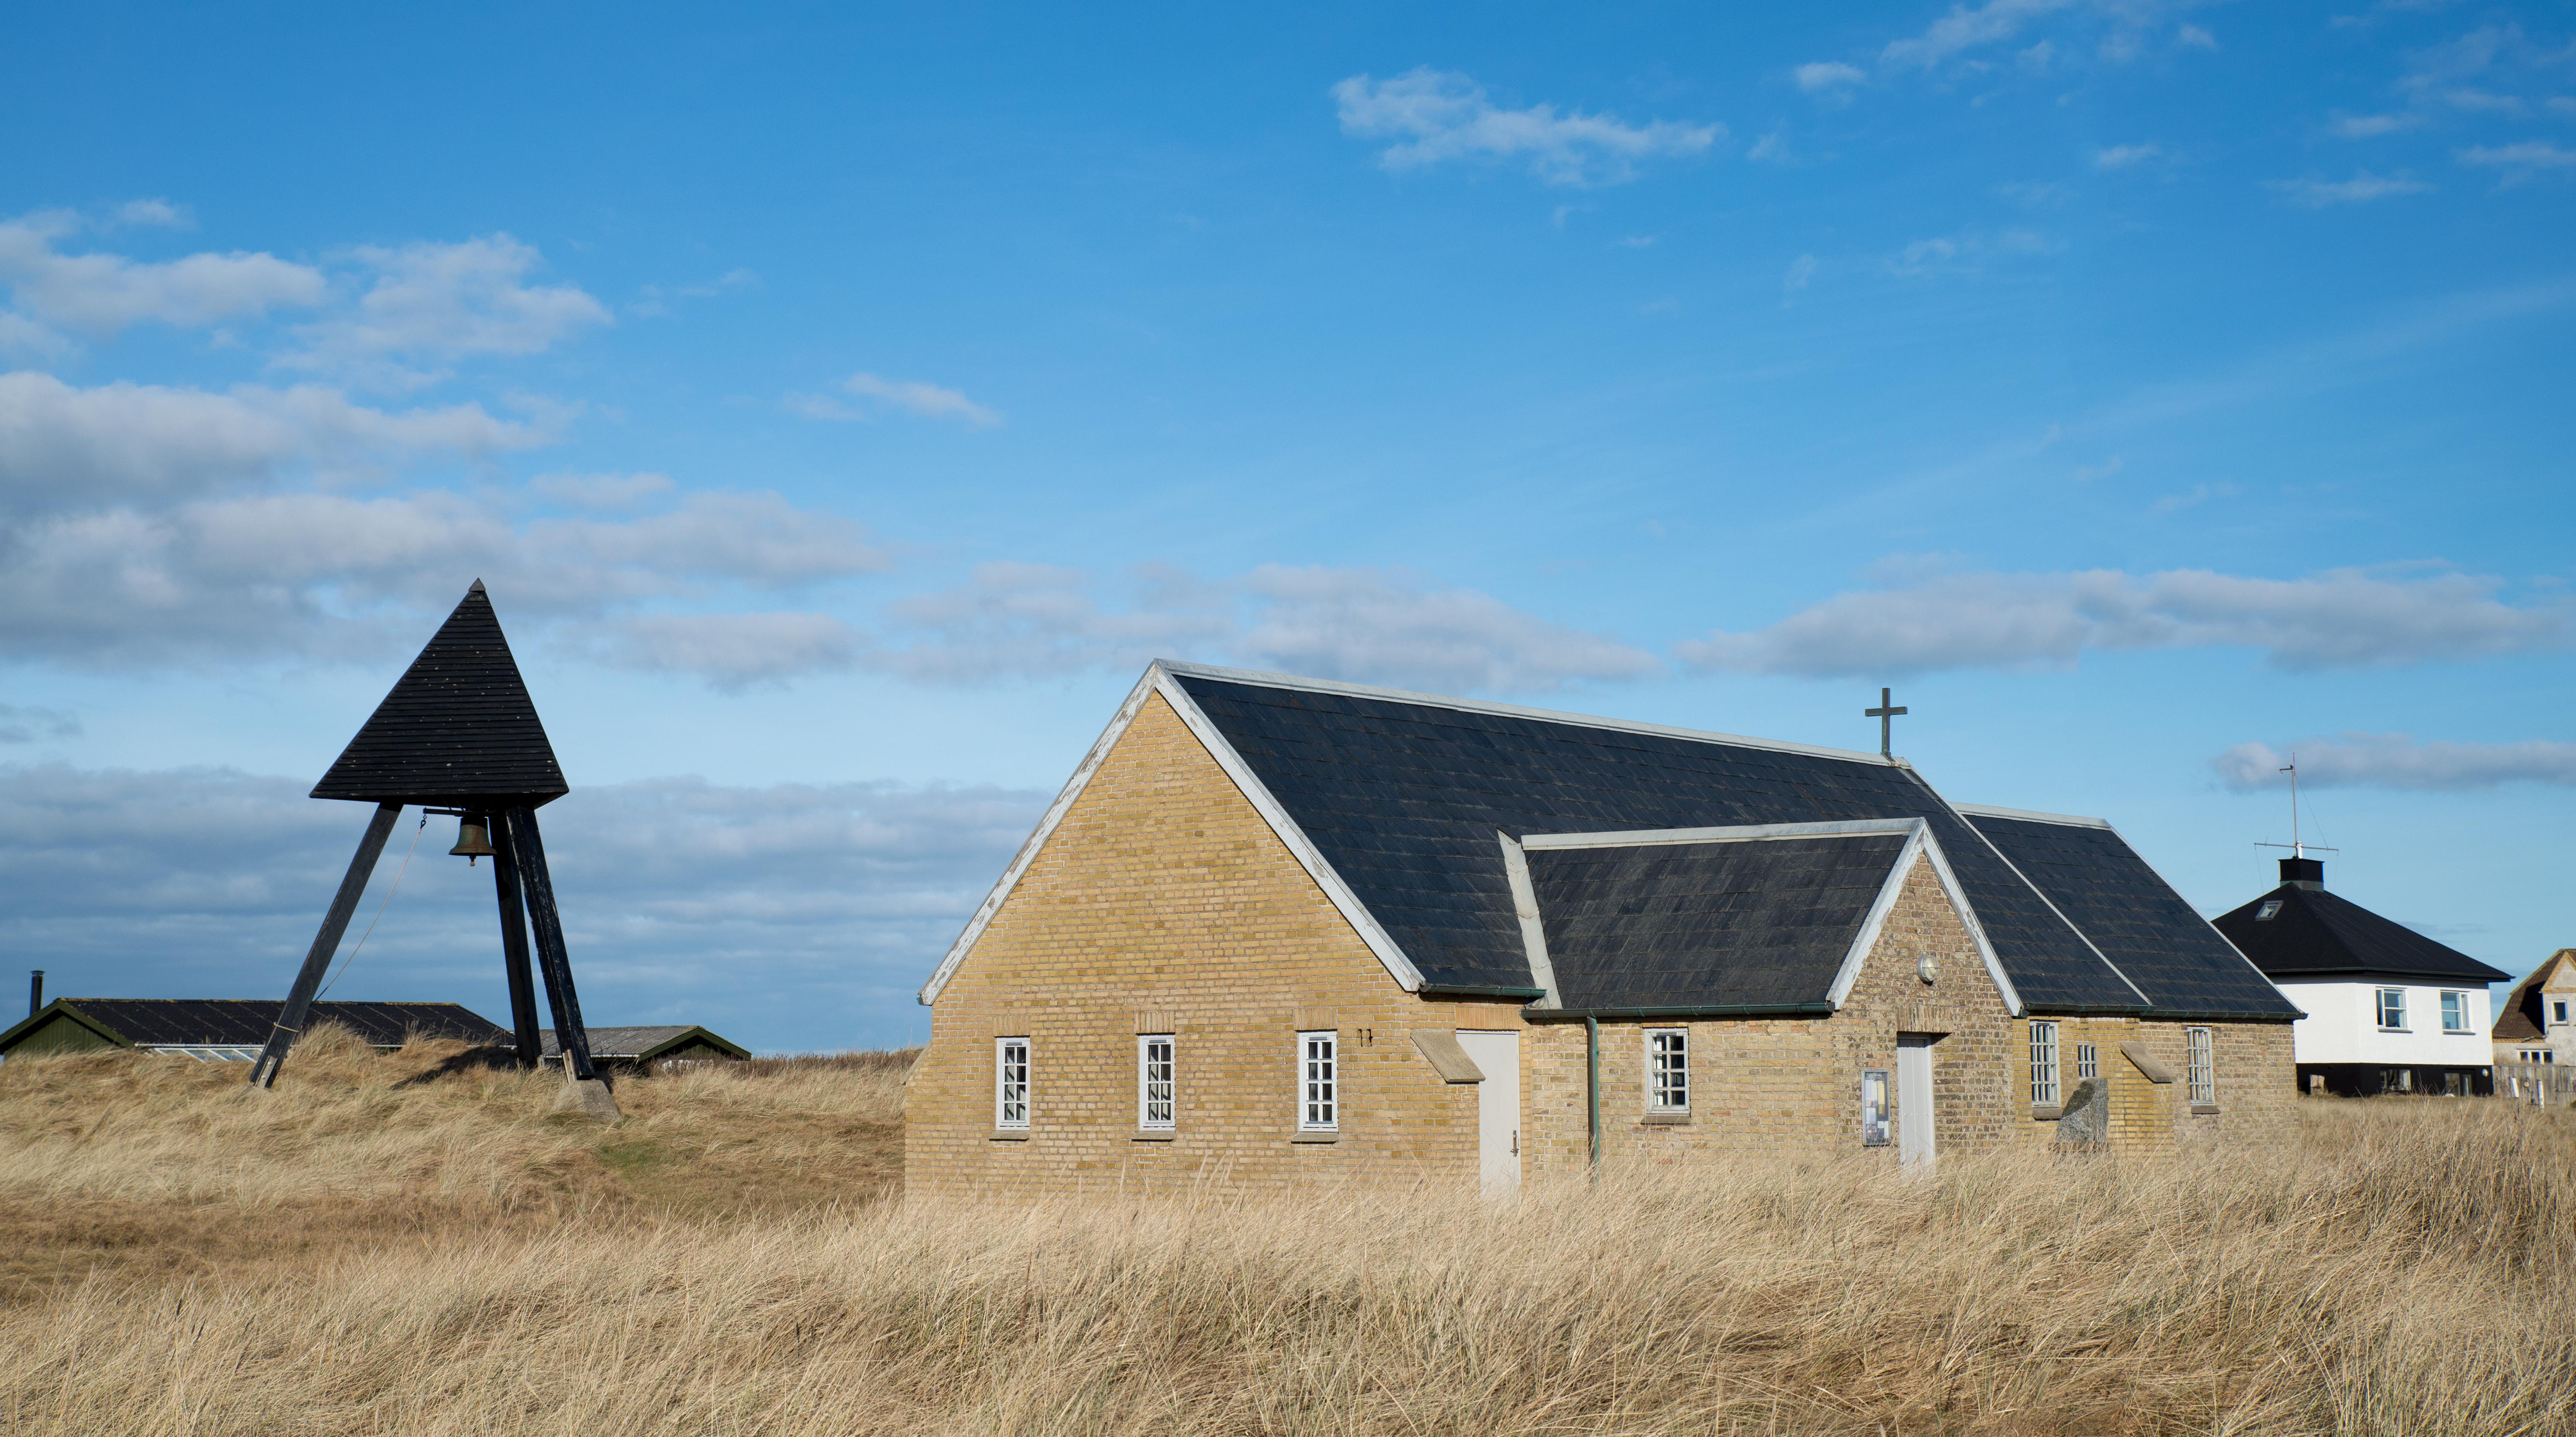 Lildstrand kirke